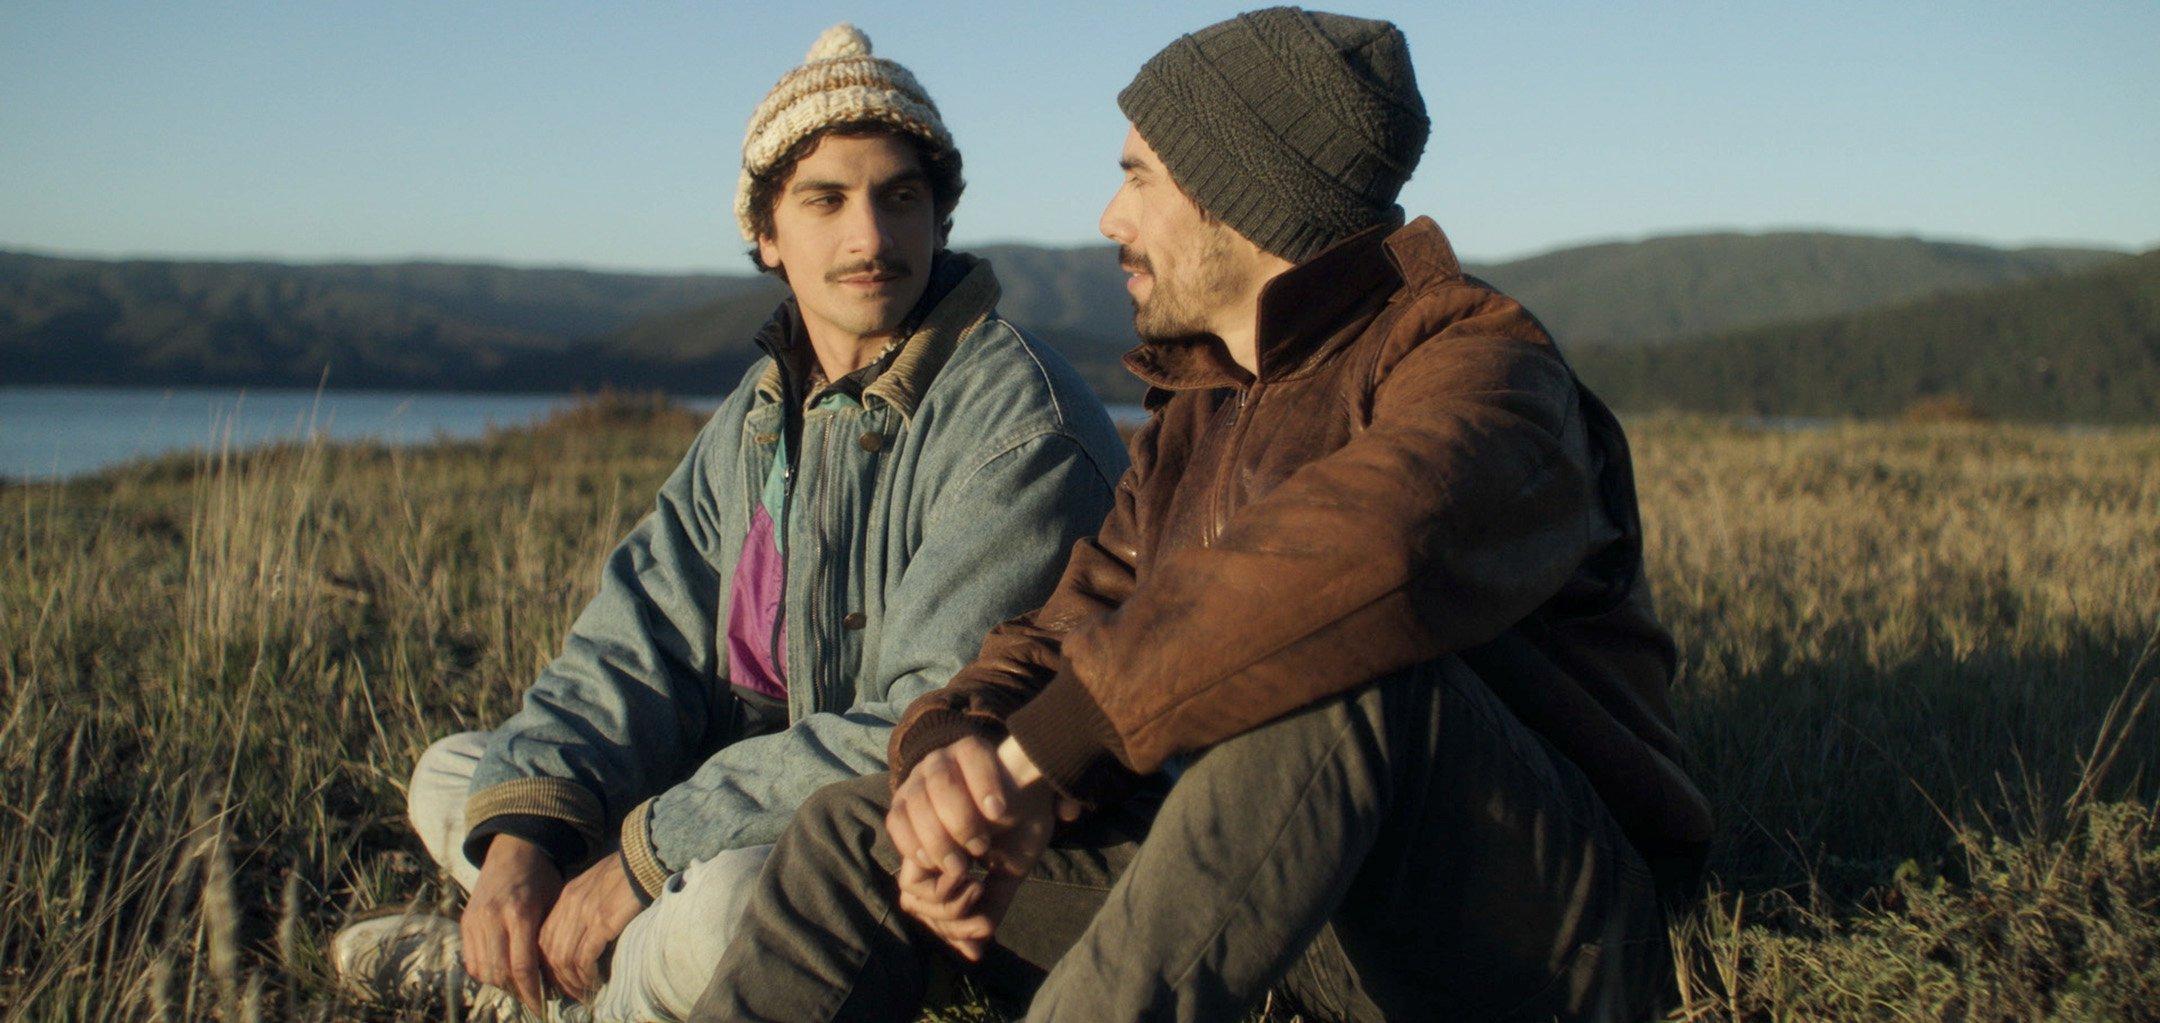 Antonio Altamirano and Samuel González in The Strong Ones (2019)